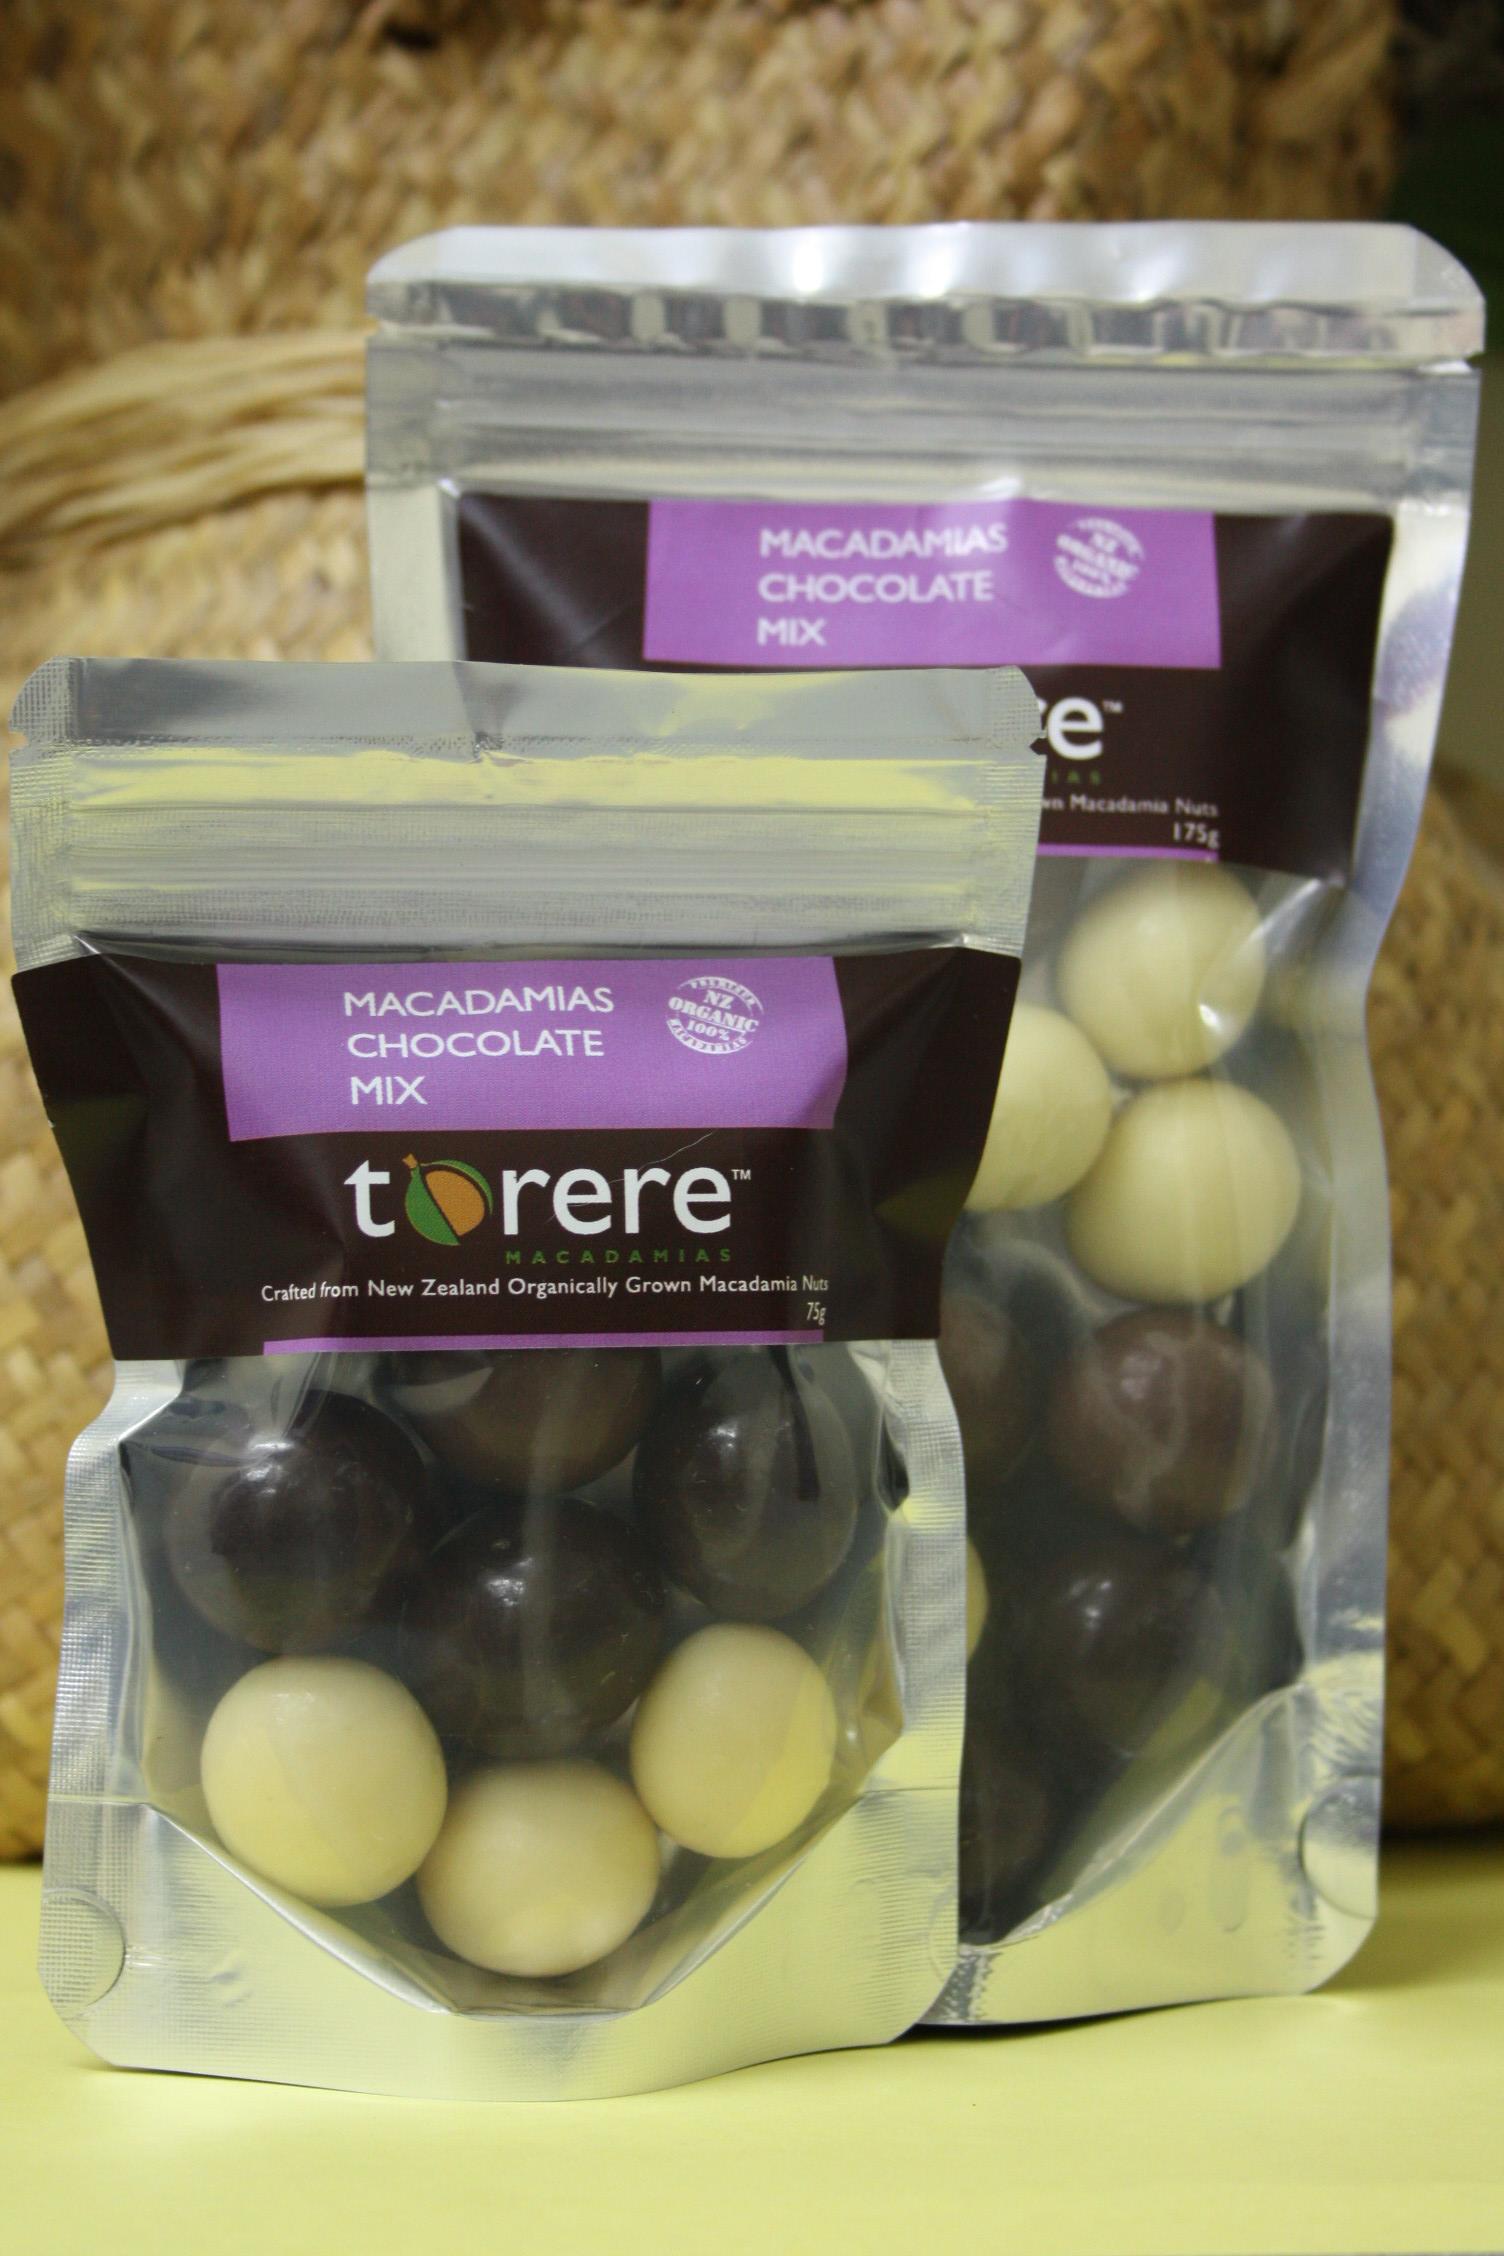 Macadamias Chocolate Mix Torere Macadamias